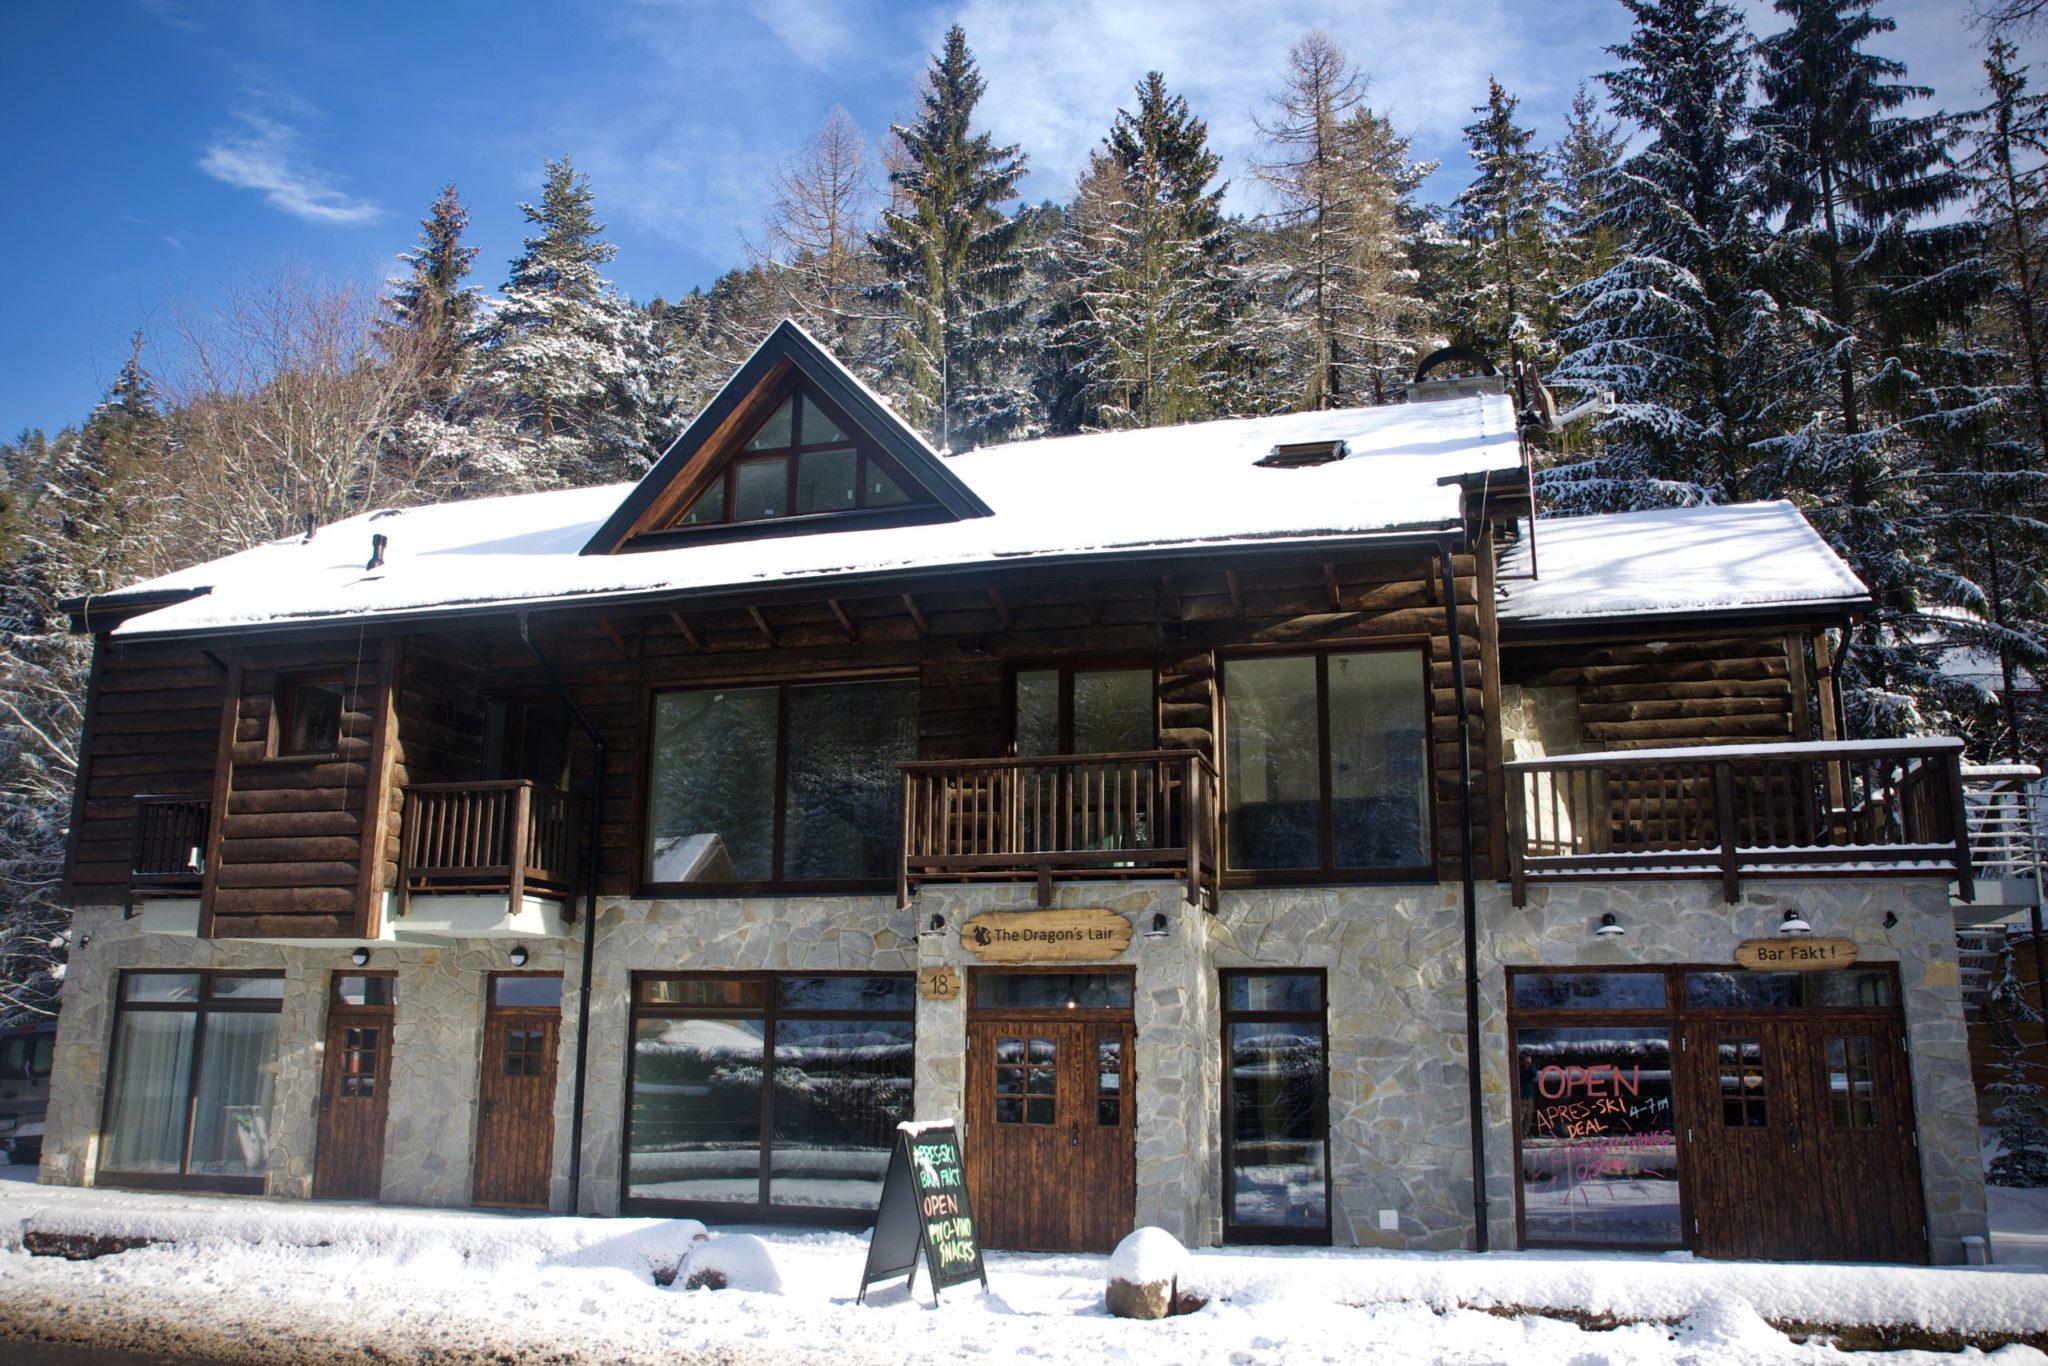 The Dragon's Lair Ski Chalet: Jasna, Slovakia